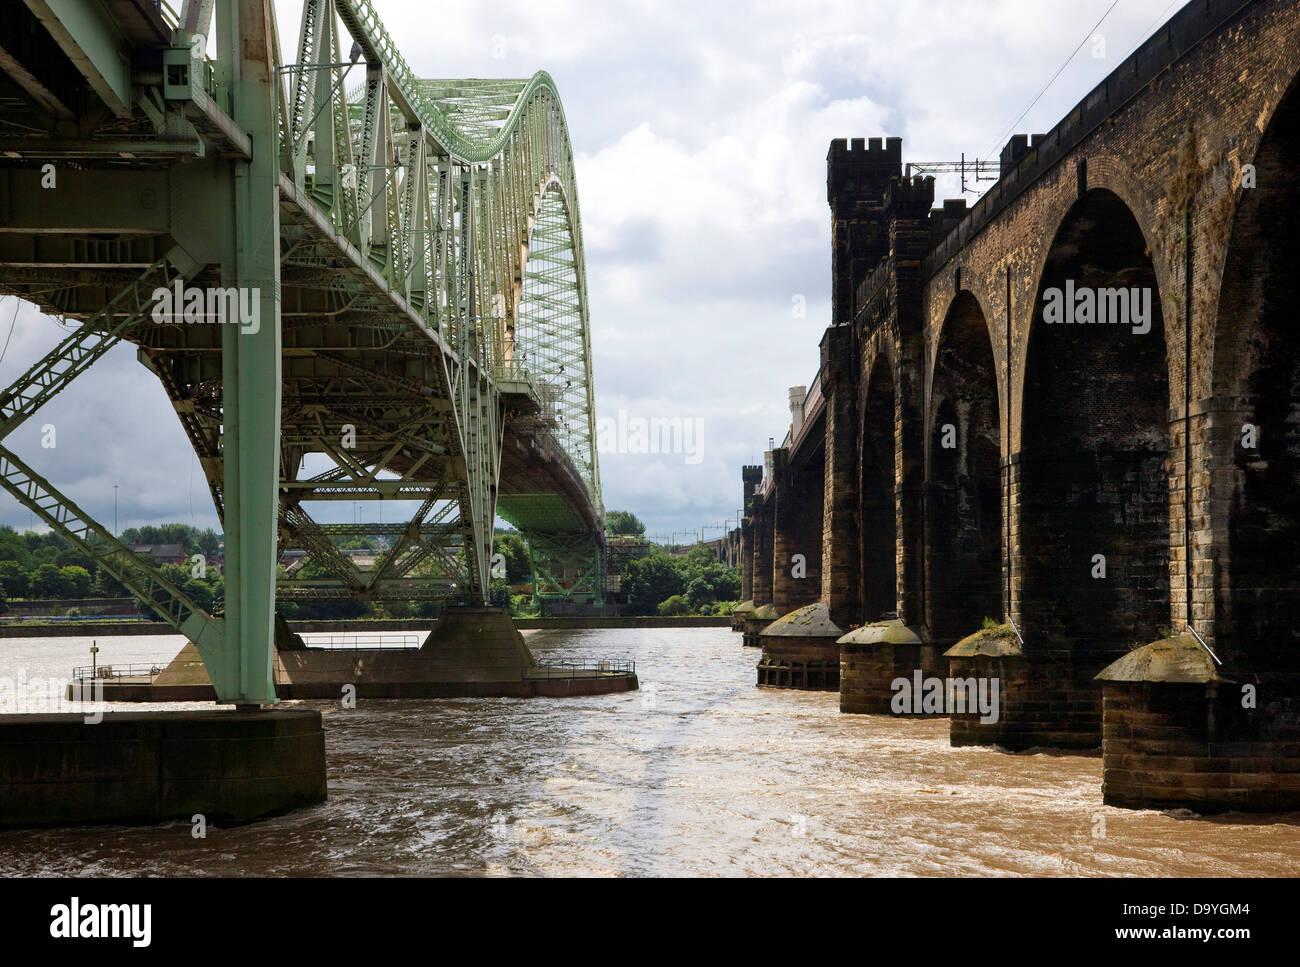 Railway bridge and the Runcorn-Widnes Bridge across the River Mersey, Merseyside, England - Stock Image